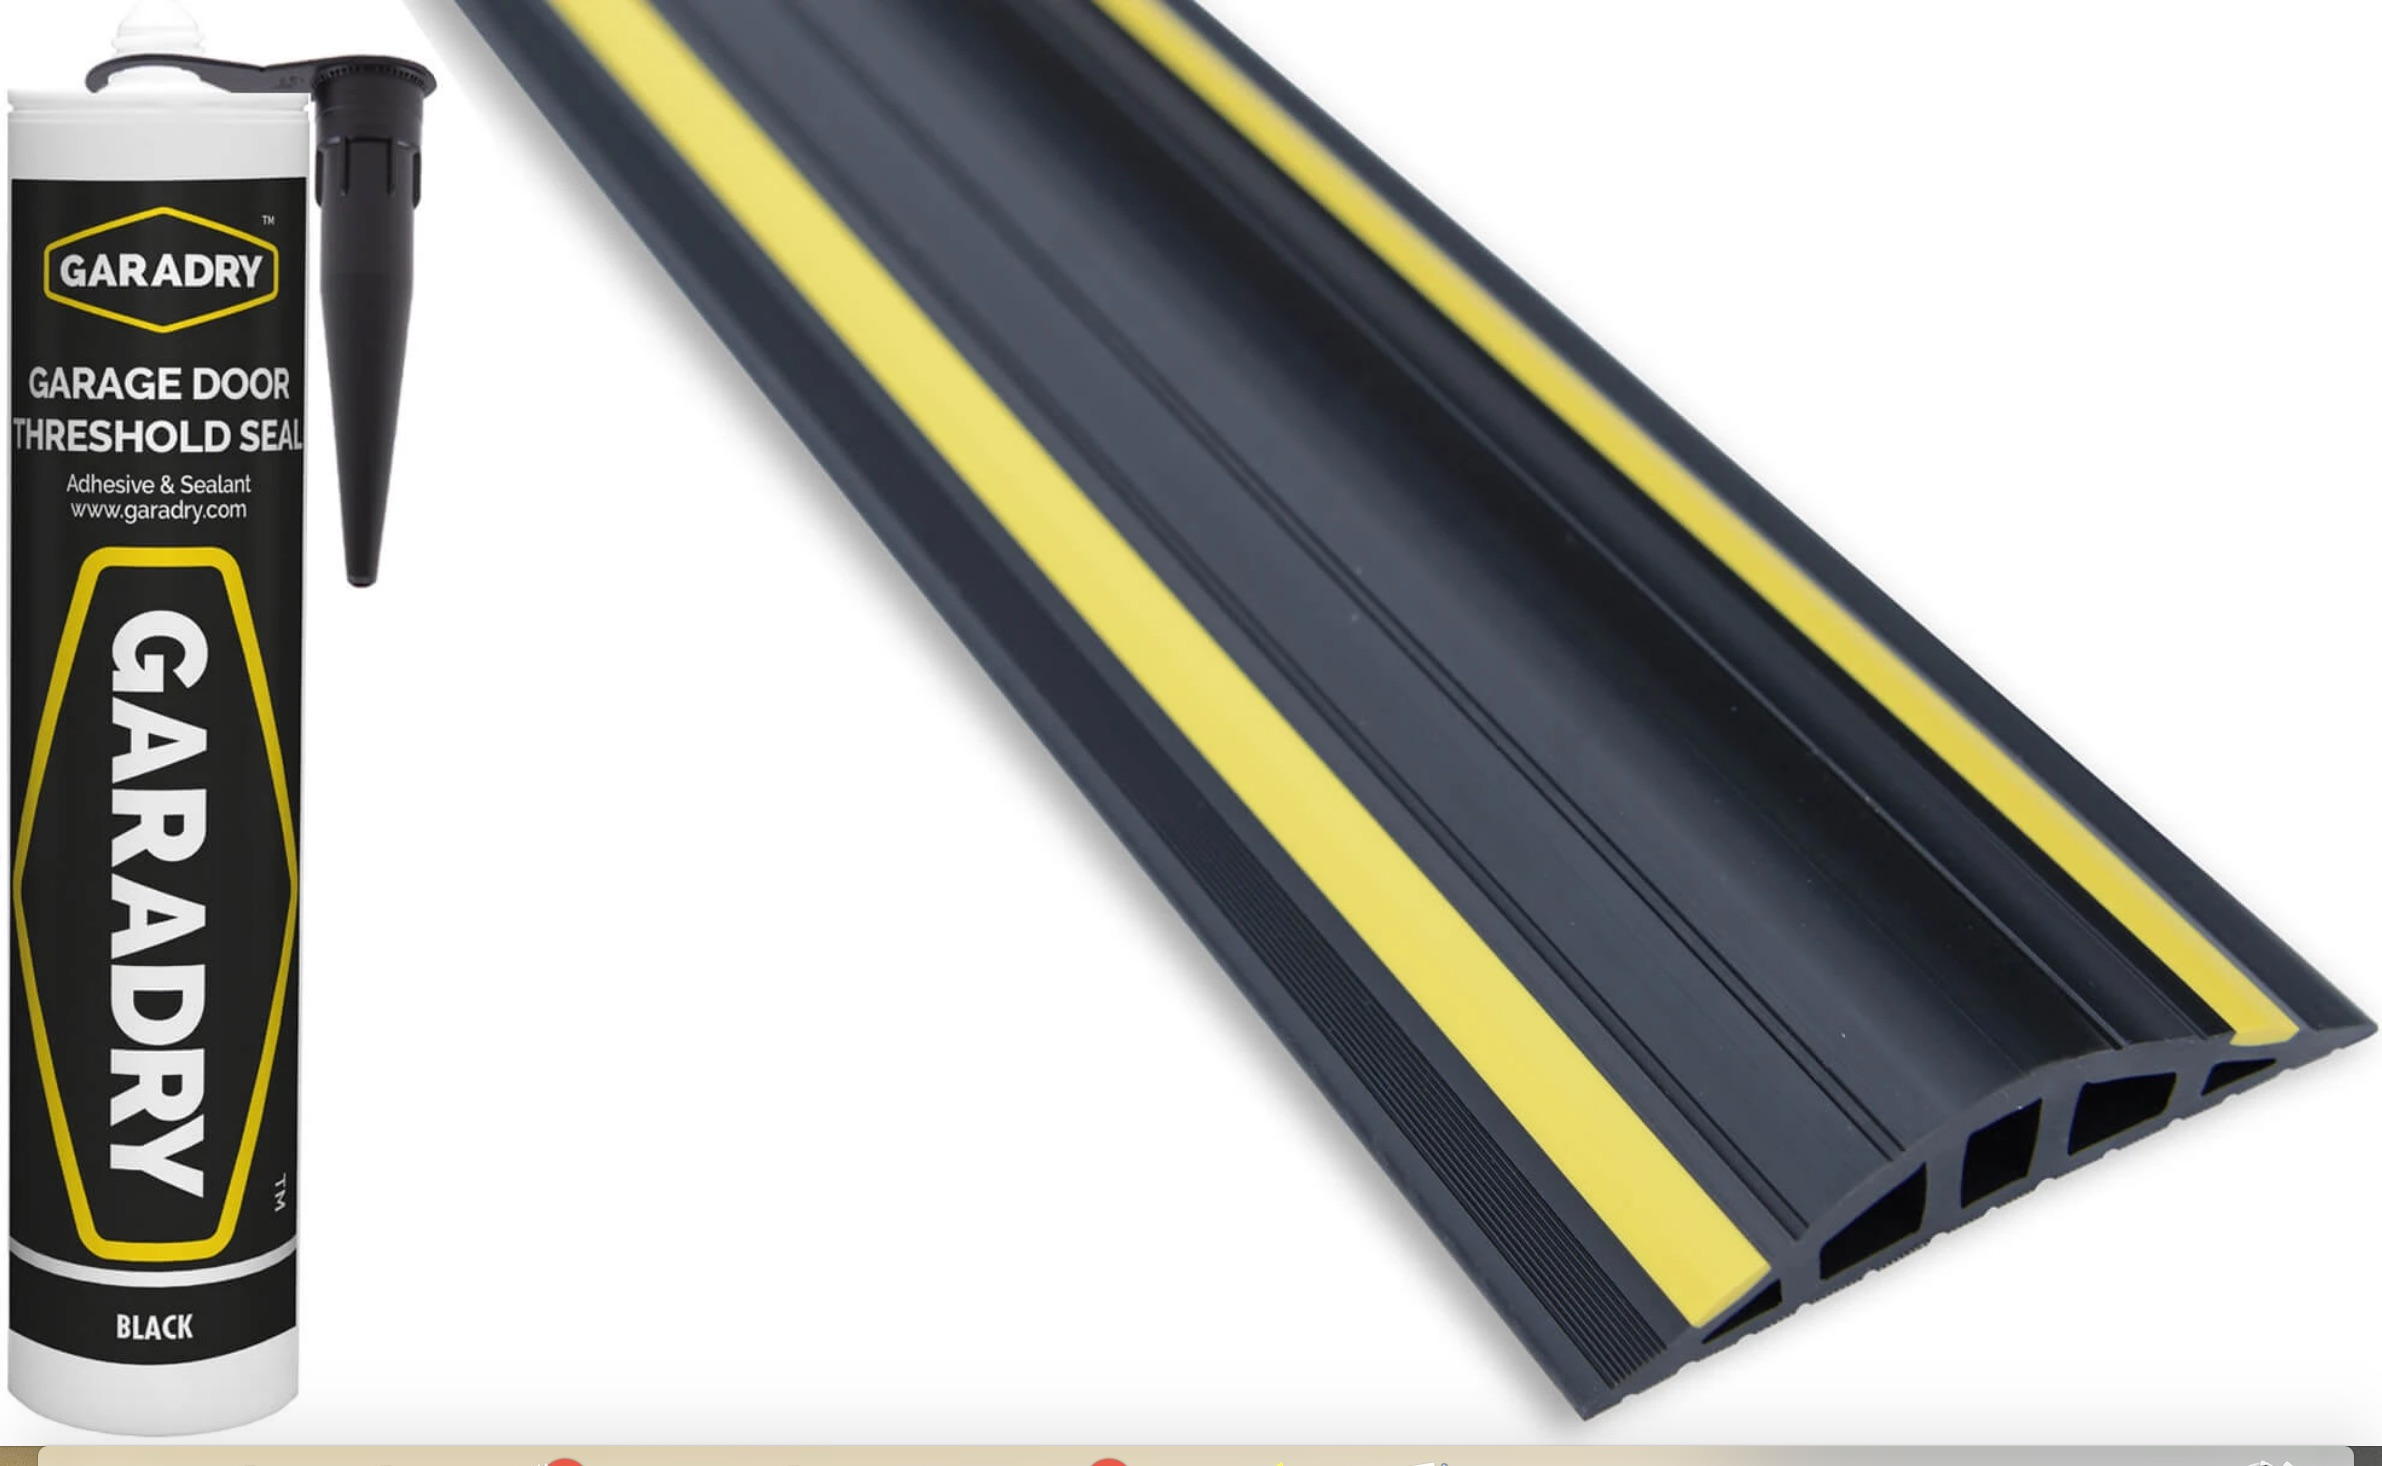 25mm High x 4.34m - 14 foot 3 Long 2 x adhesives